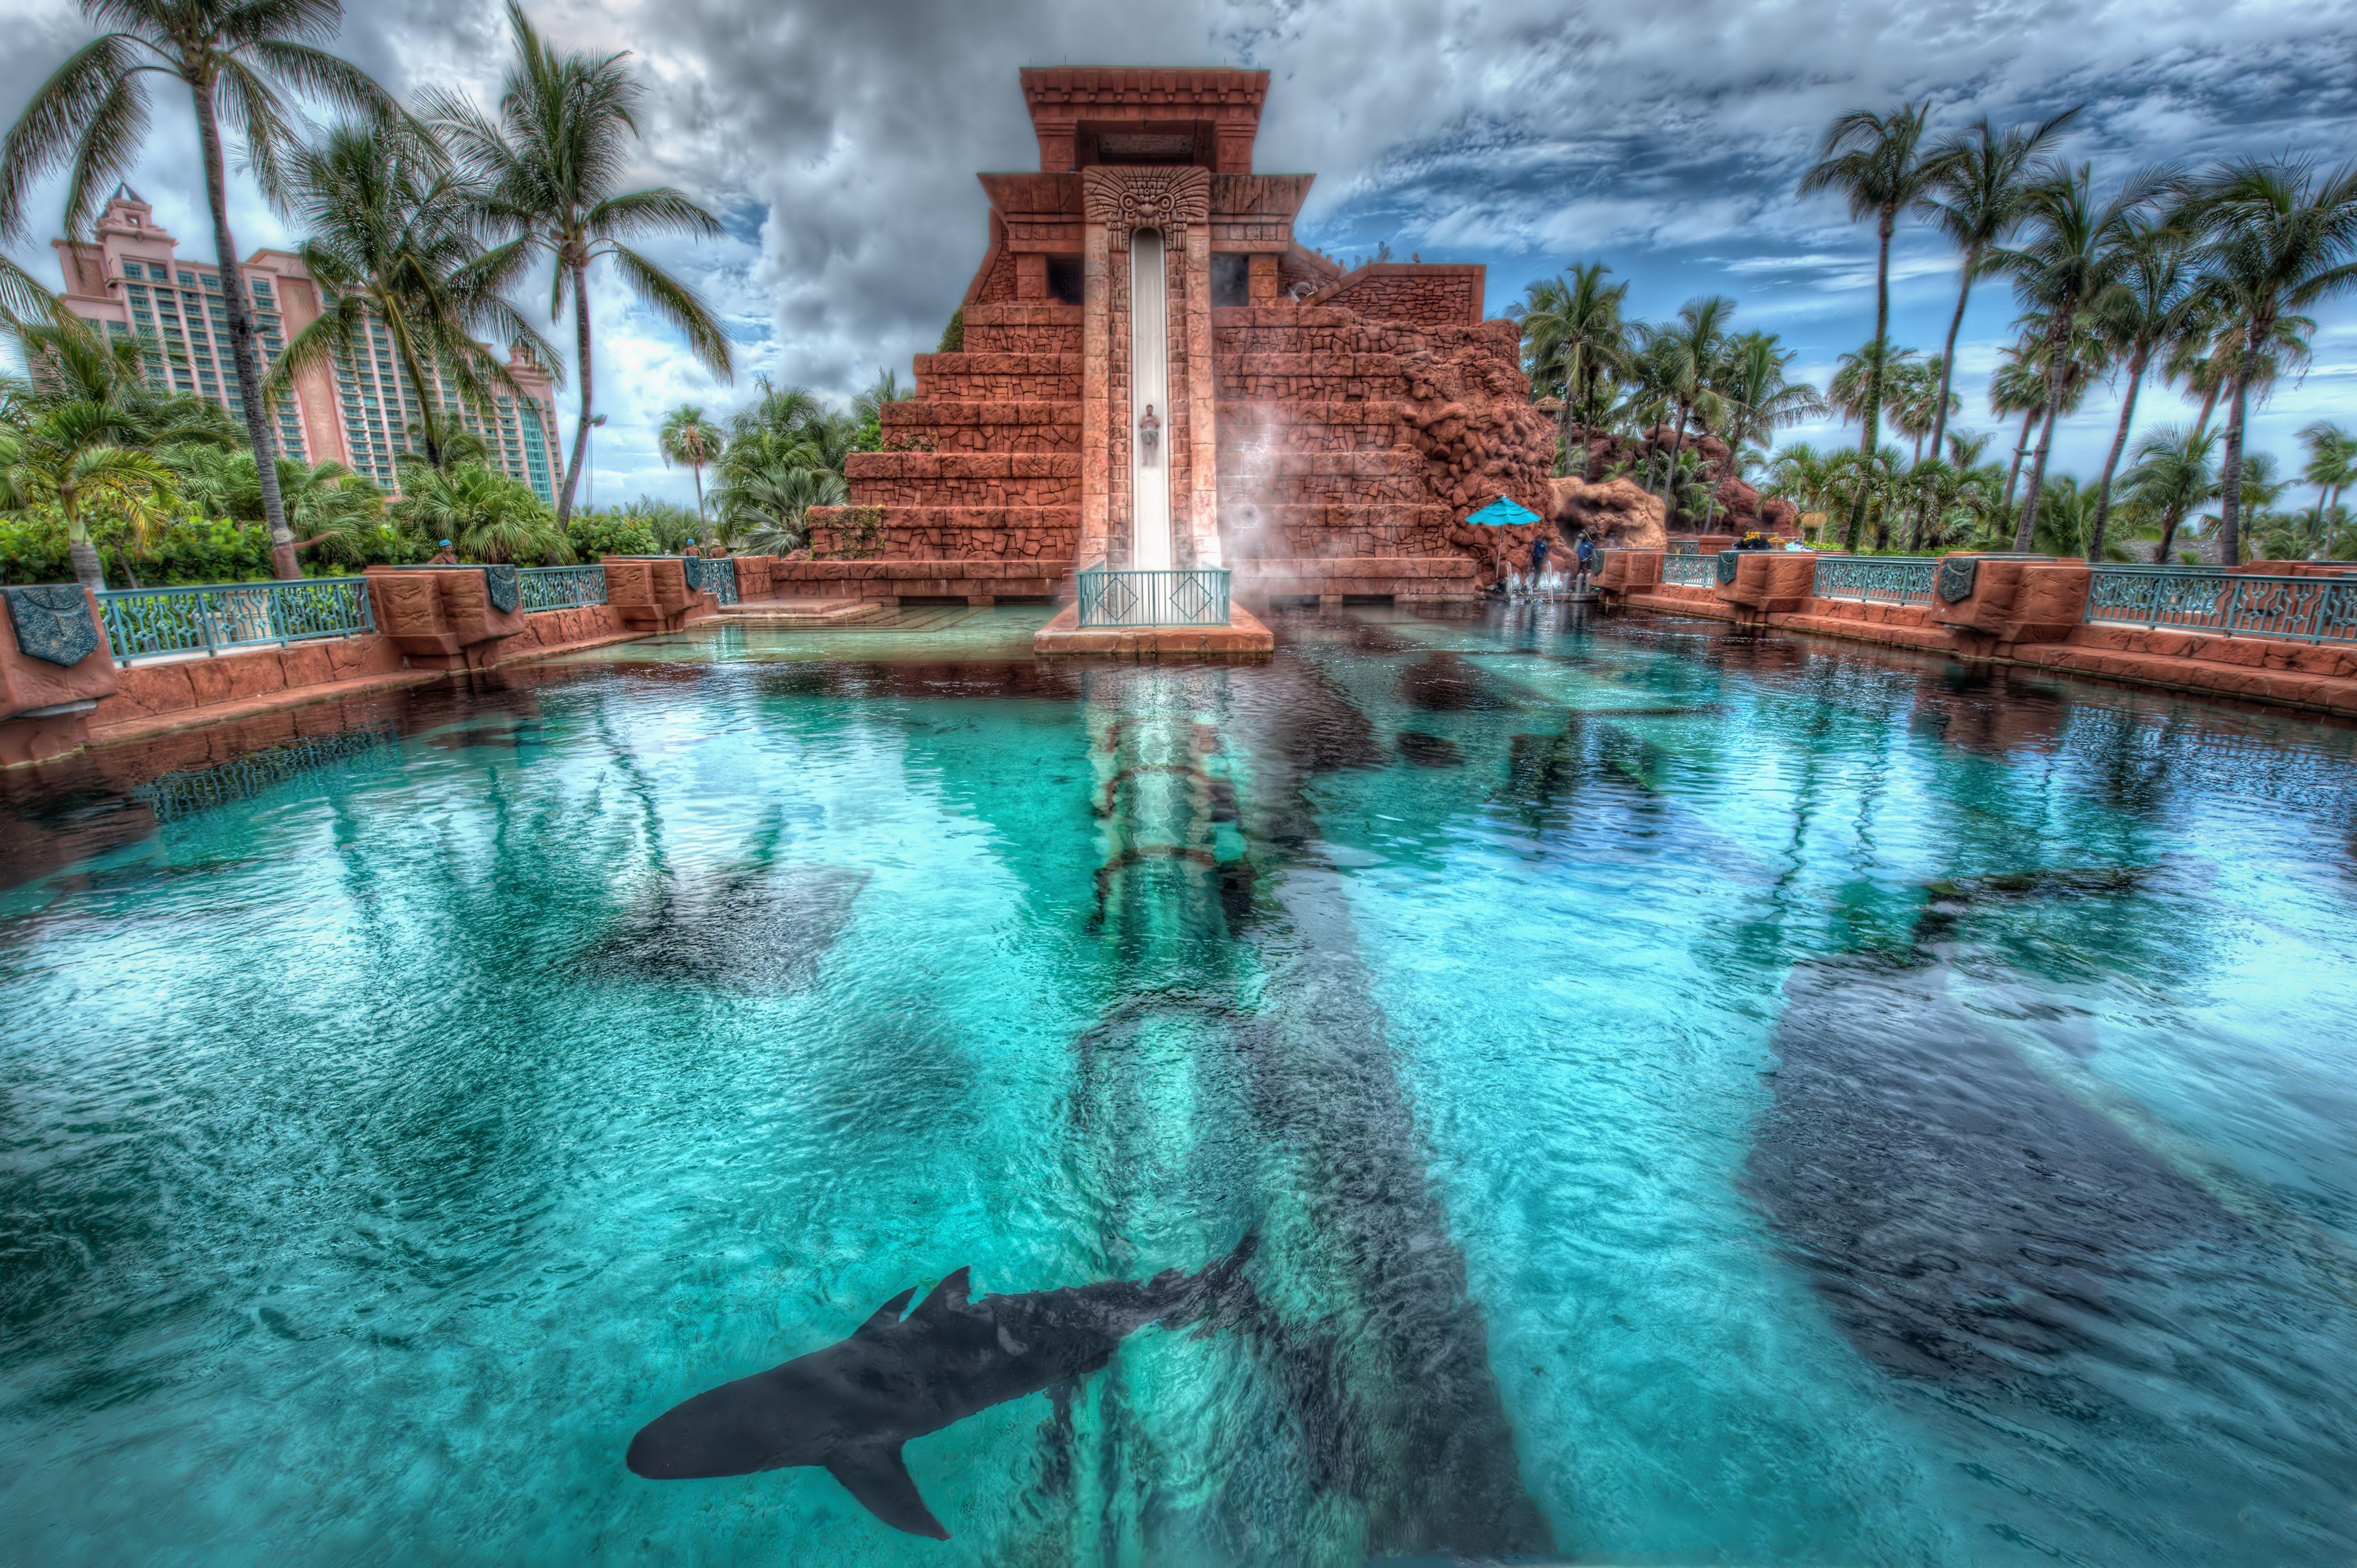 Editar Fondos De Pantalla Para Descargar Nassau Las Bahamas Palms Piscina Fondos De Pantalla Gratis Image Hoteleria Y Turismo Bahamas Lugares Maravillosos